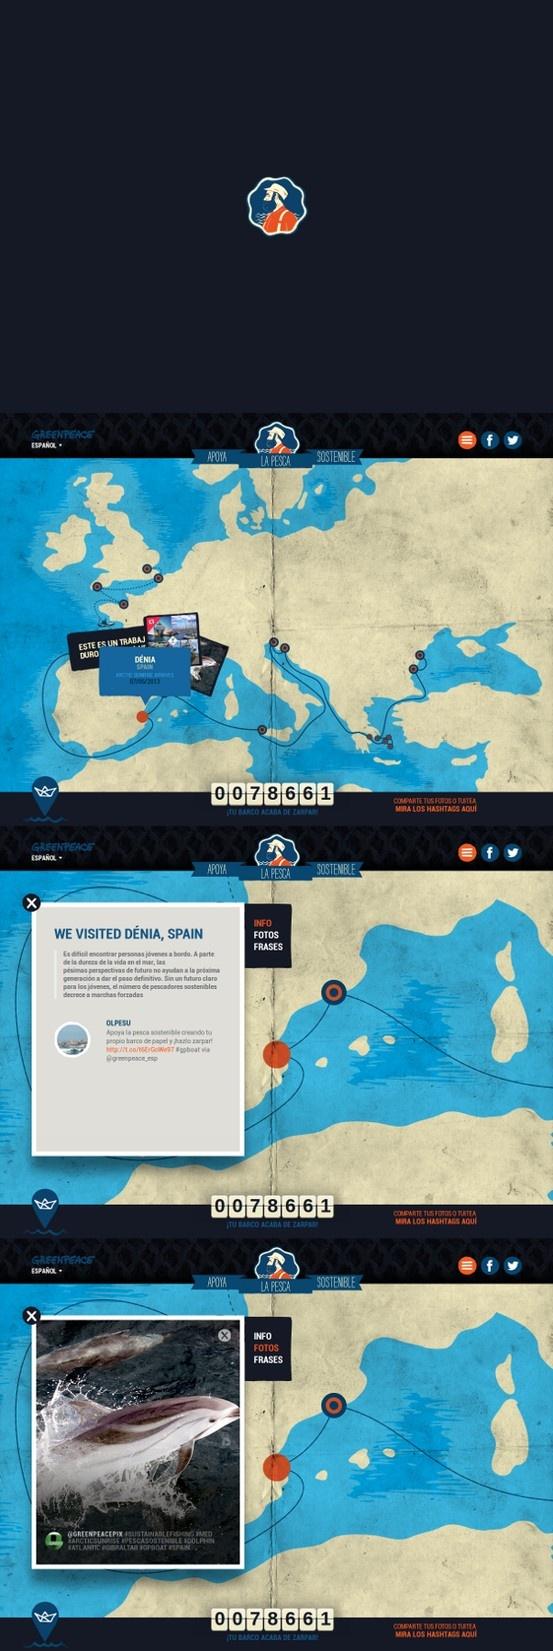 Myboat - Greenpeace 25 May 2013 http://www.awwwards.com/web-design-awards/myboat-greenpeace #webdesign #inspiration #UI #Illustration #CSS3 #Animation #HTML5 #Design #Yellow #Blue #Orange